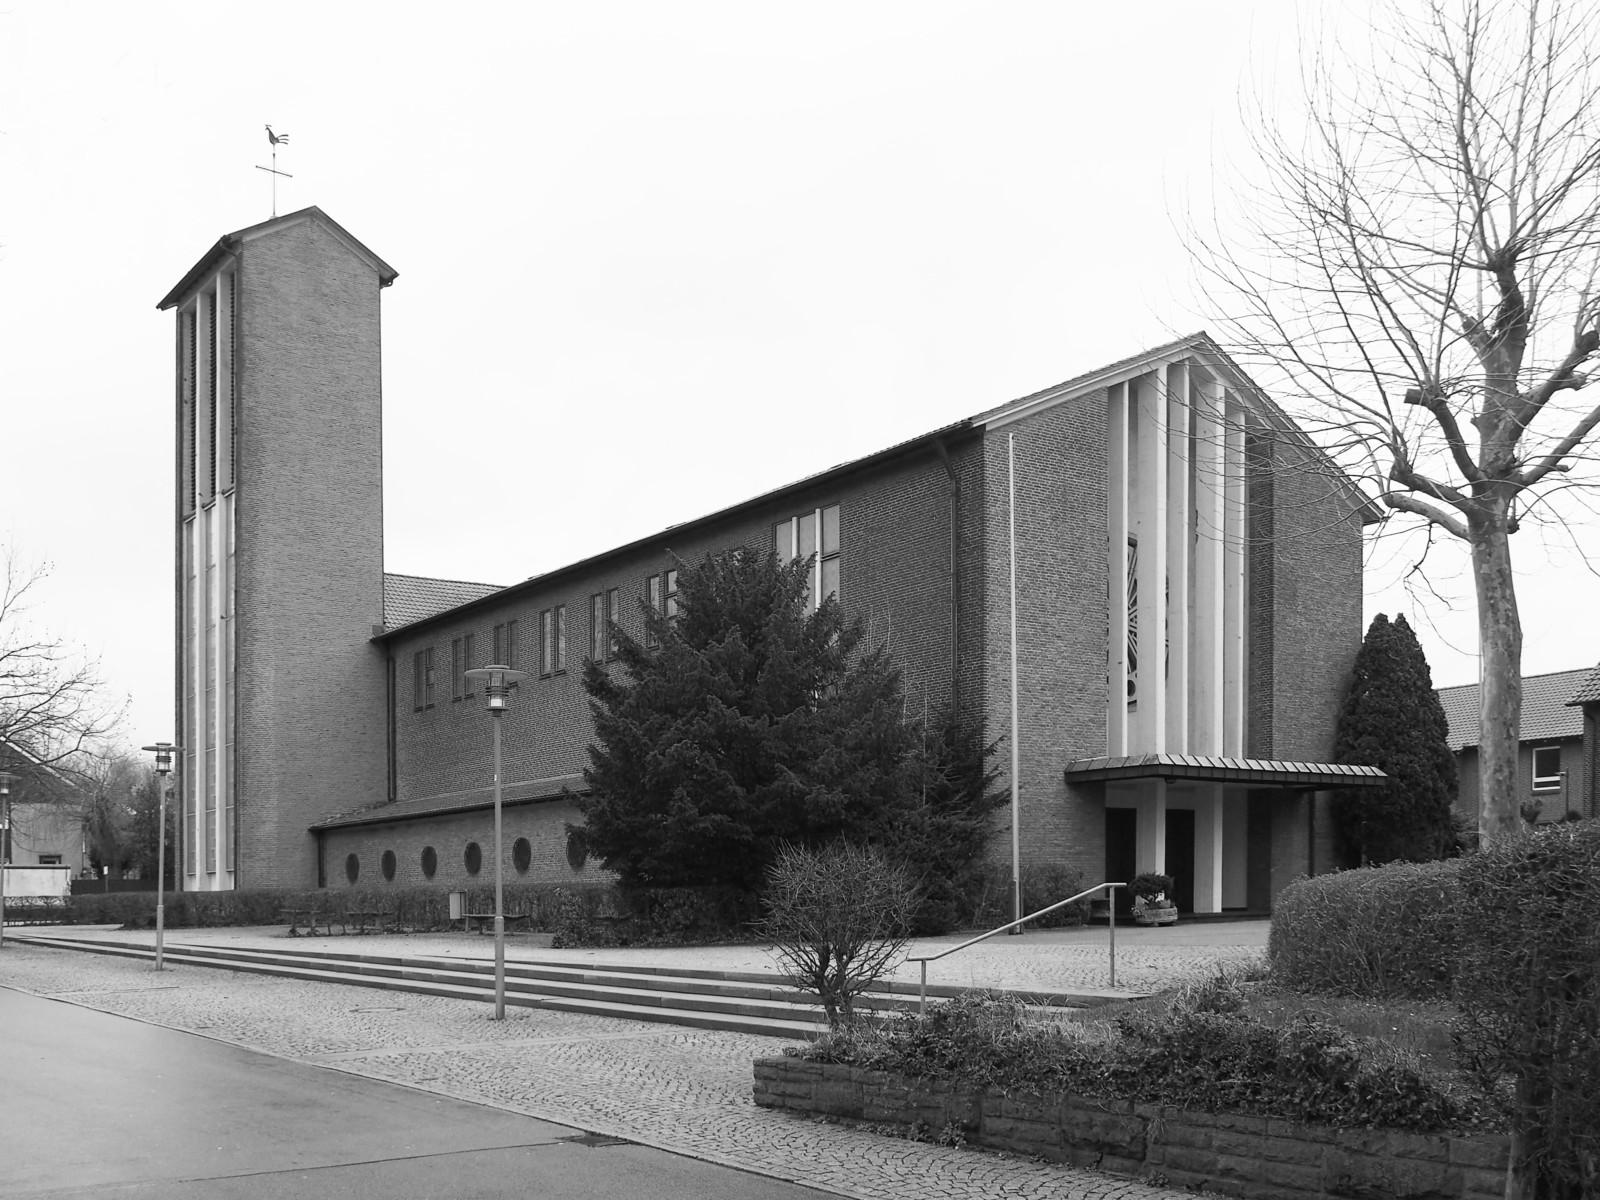 St. Elisabeth Kirche Bergkamen